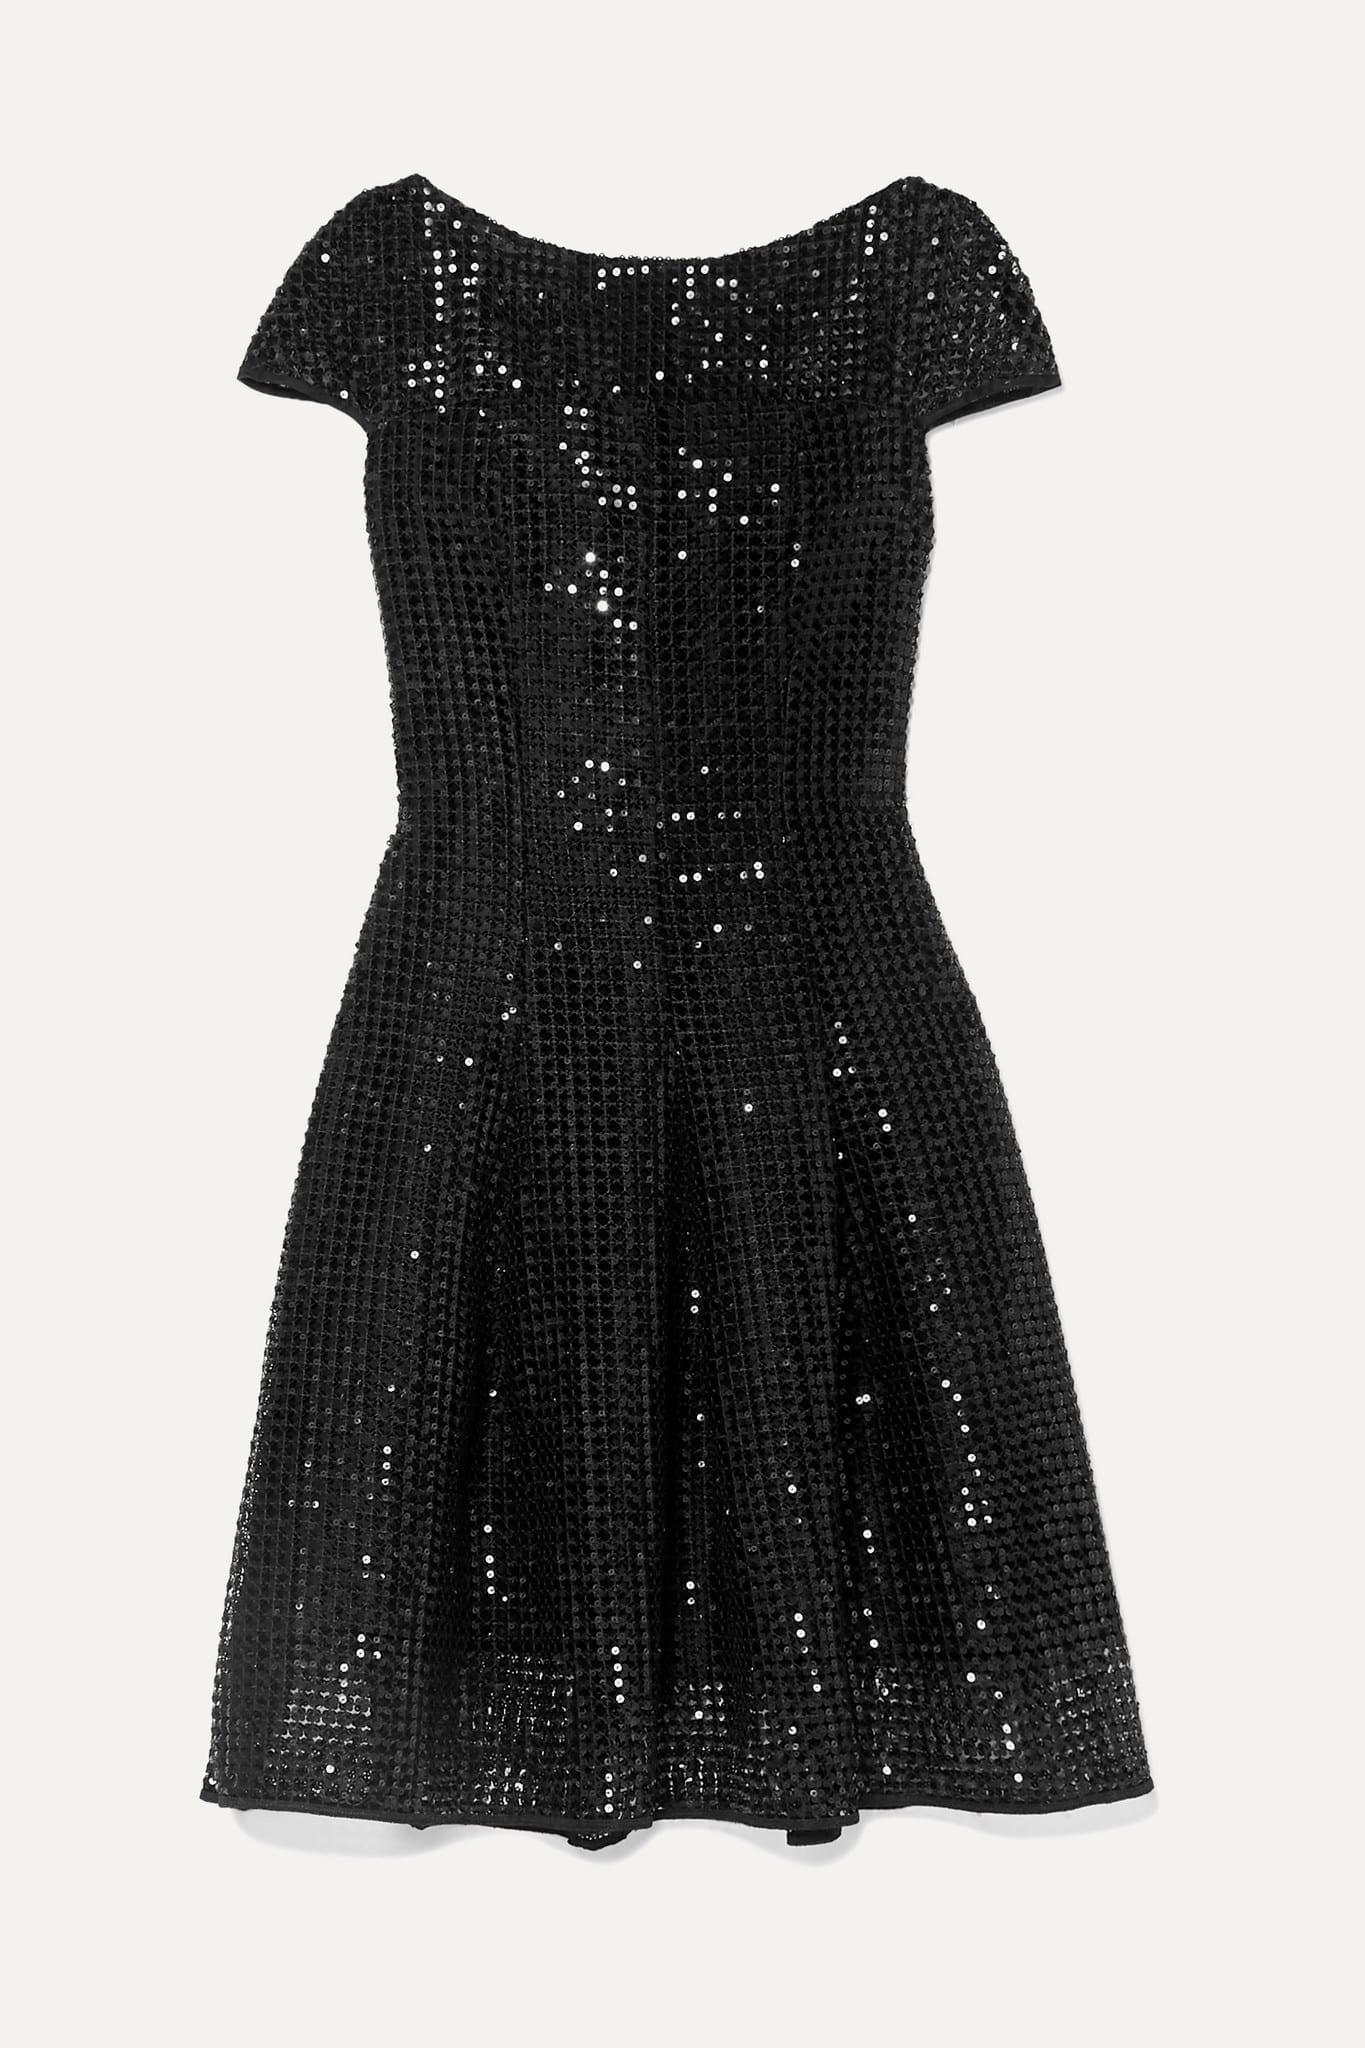 TALBOT RUNHO Fnoix Sequined Macramé Dress